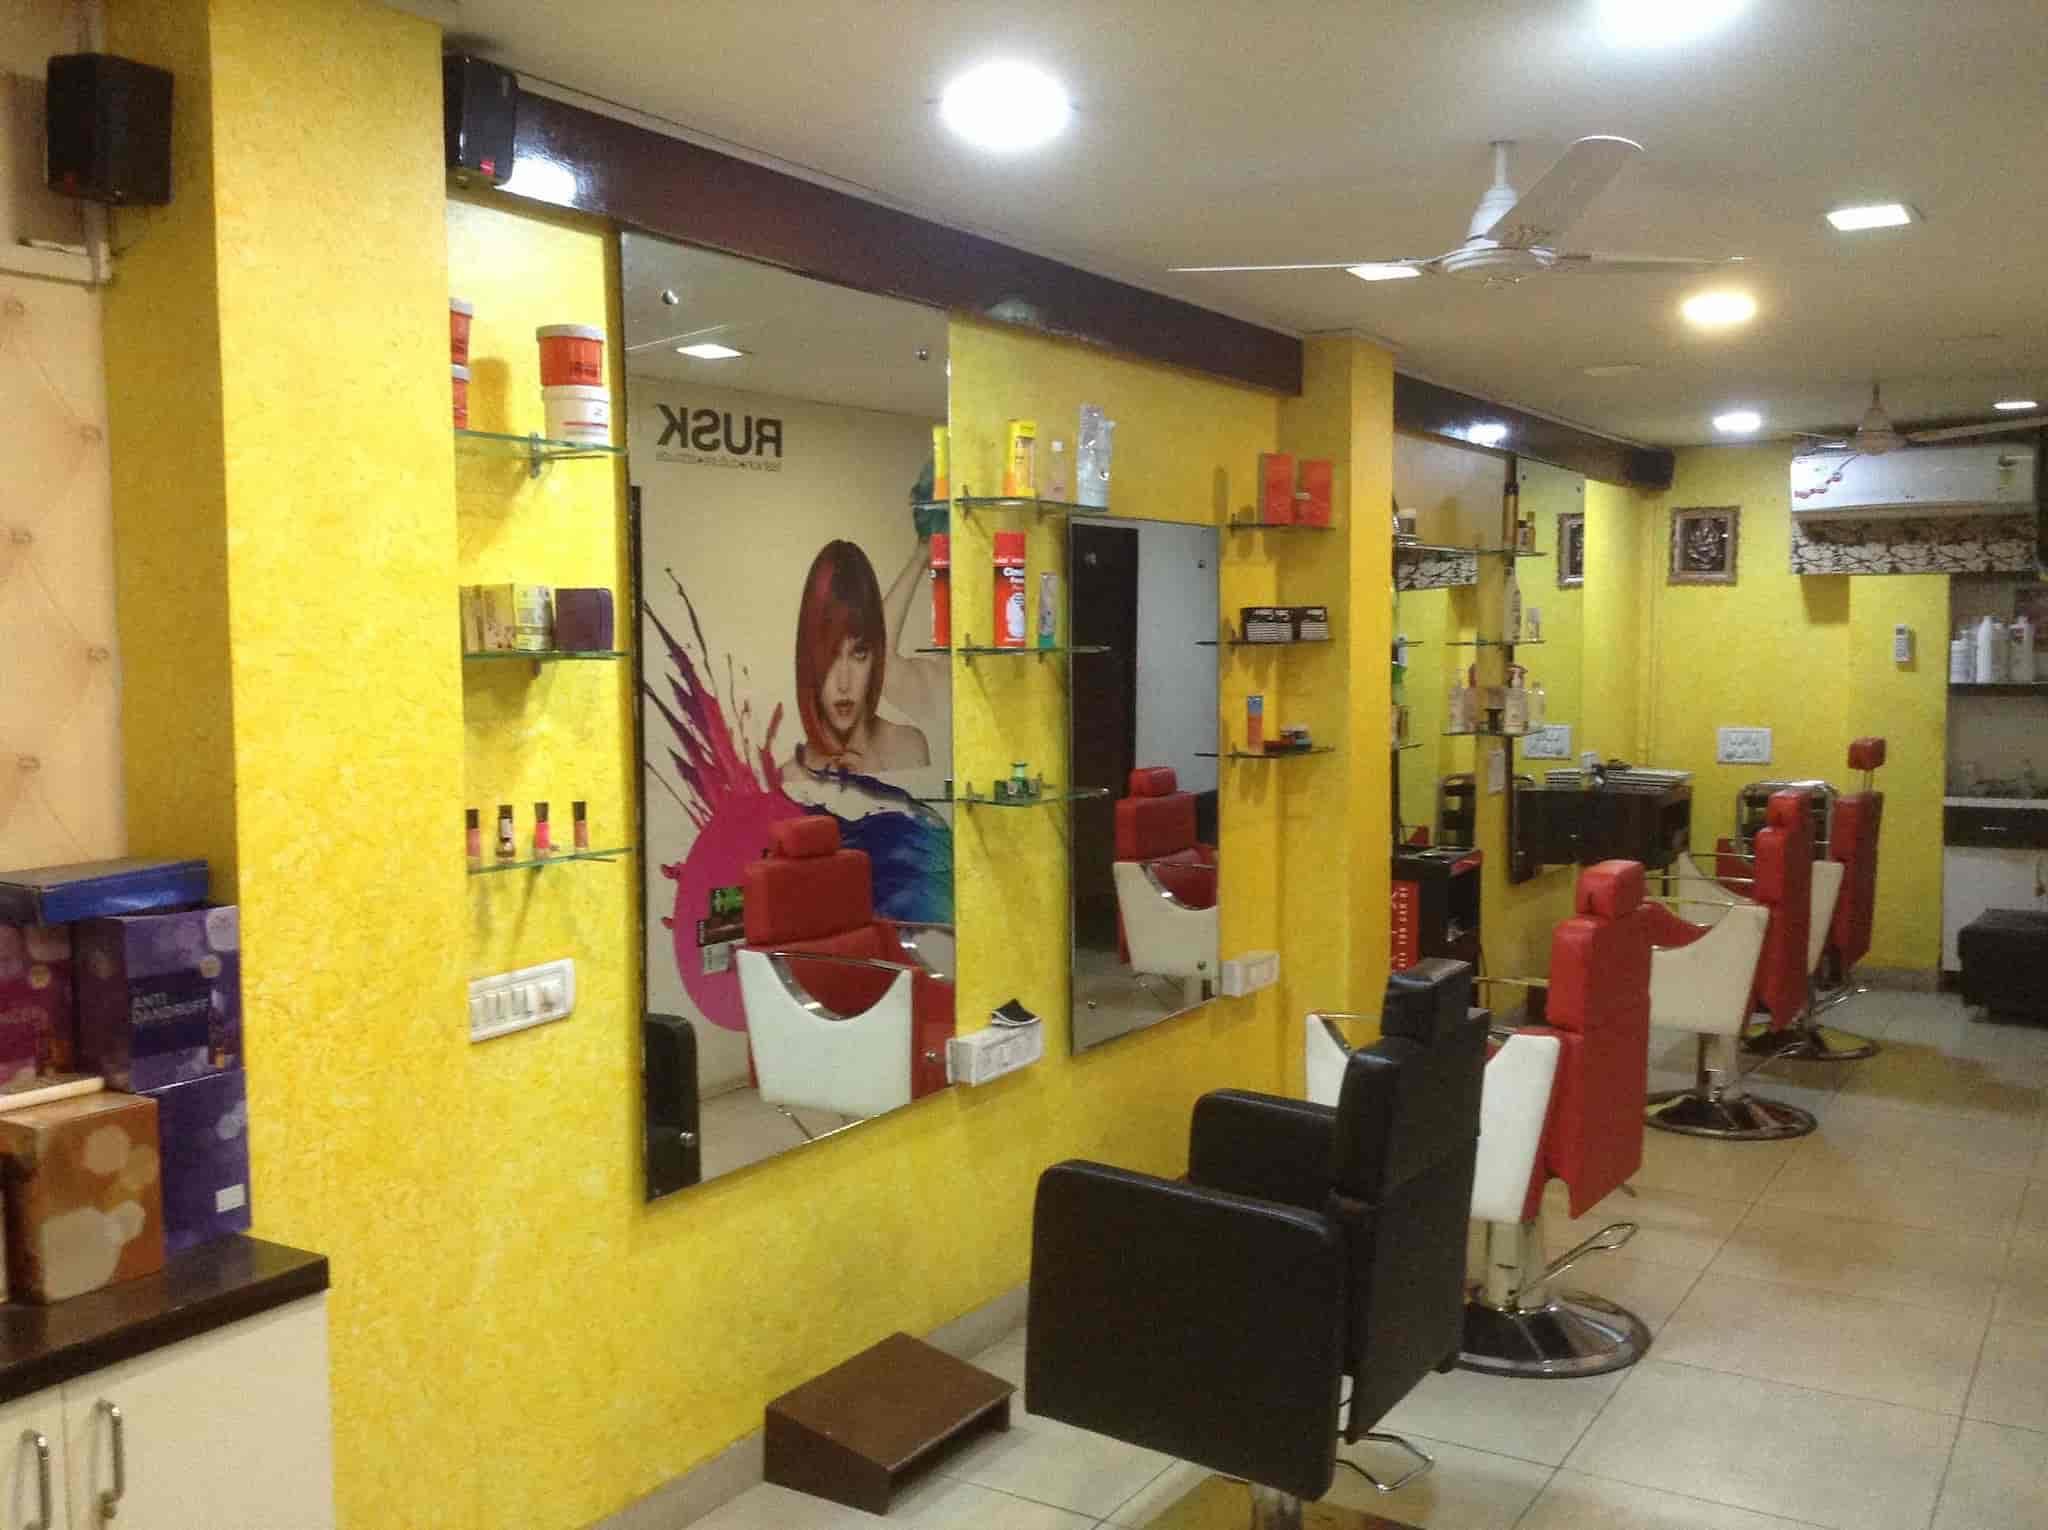 Royal Salon Geeta Bhawan Salons In Indore Justdial